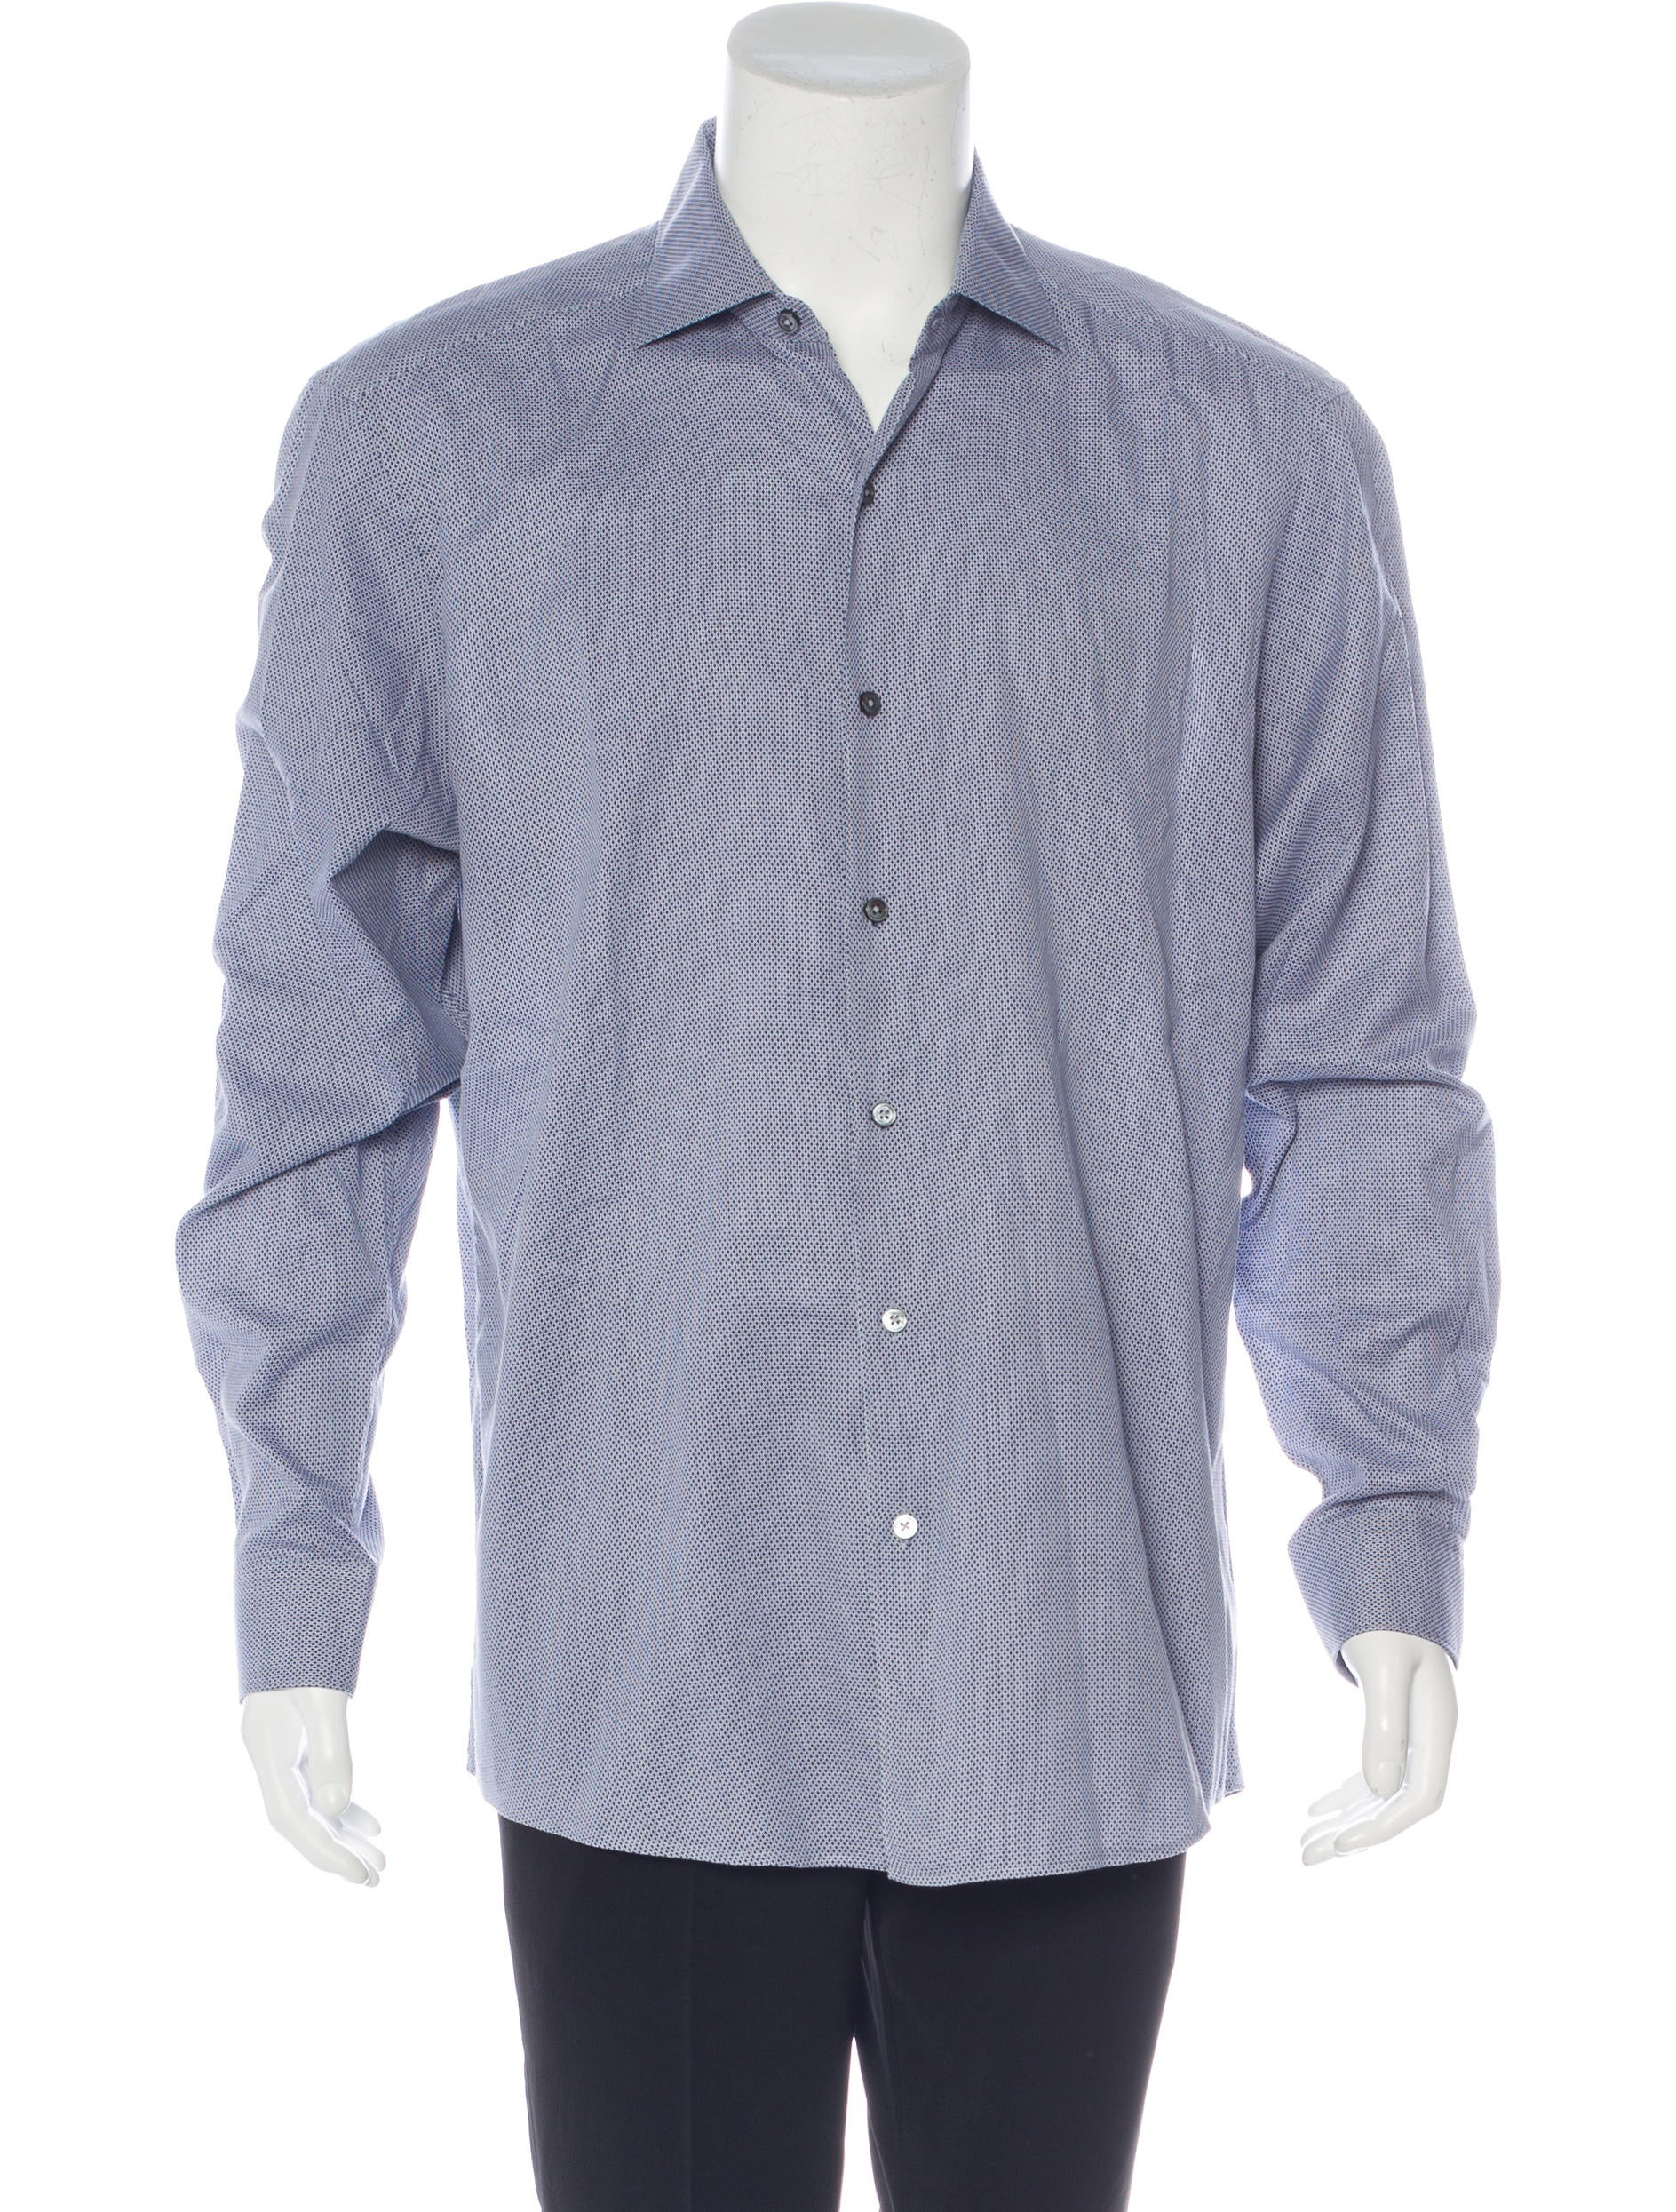 ermenegildo zegna printed woven shirt clothing zgn24997 the realreal. Black Bedroom Furniture Sets. Home Design Ideas